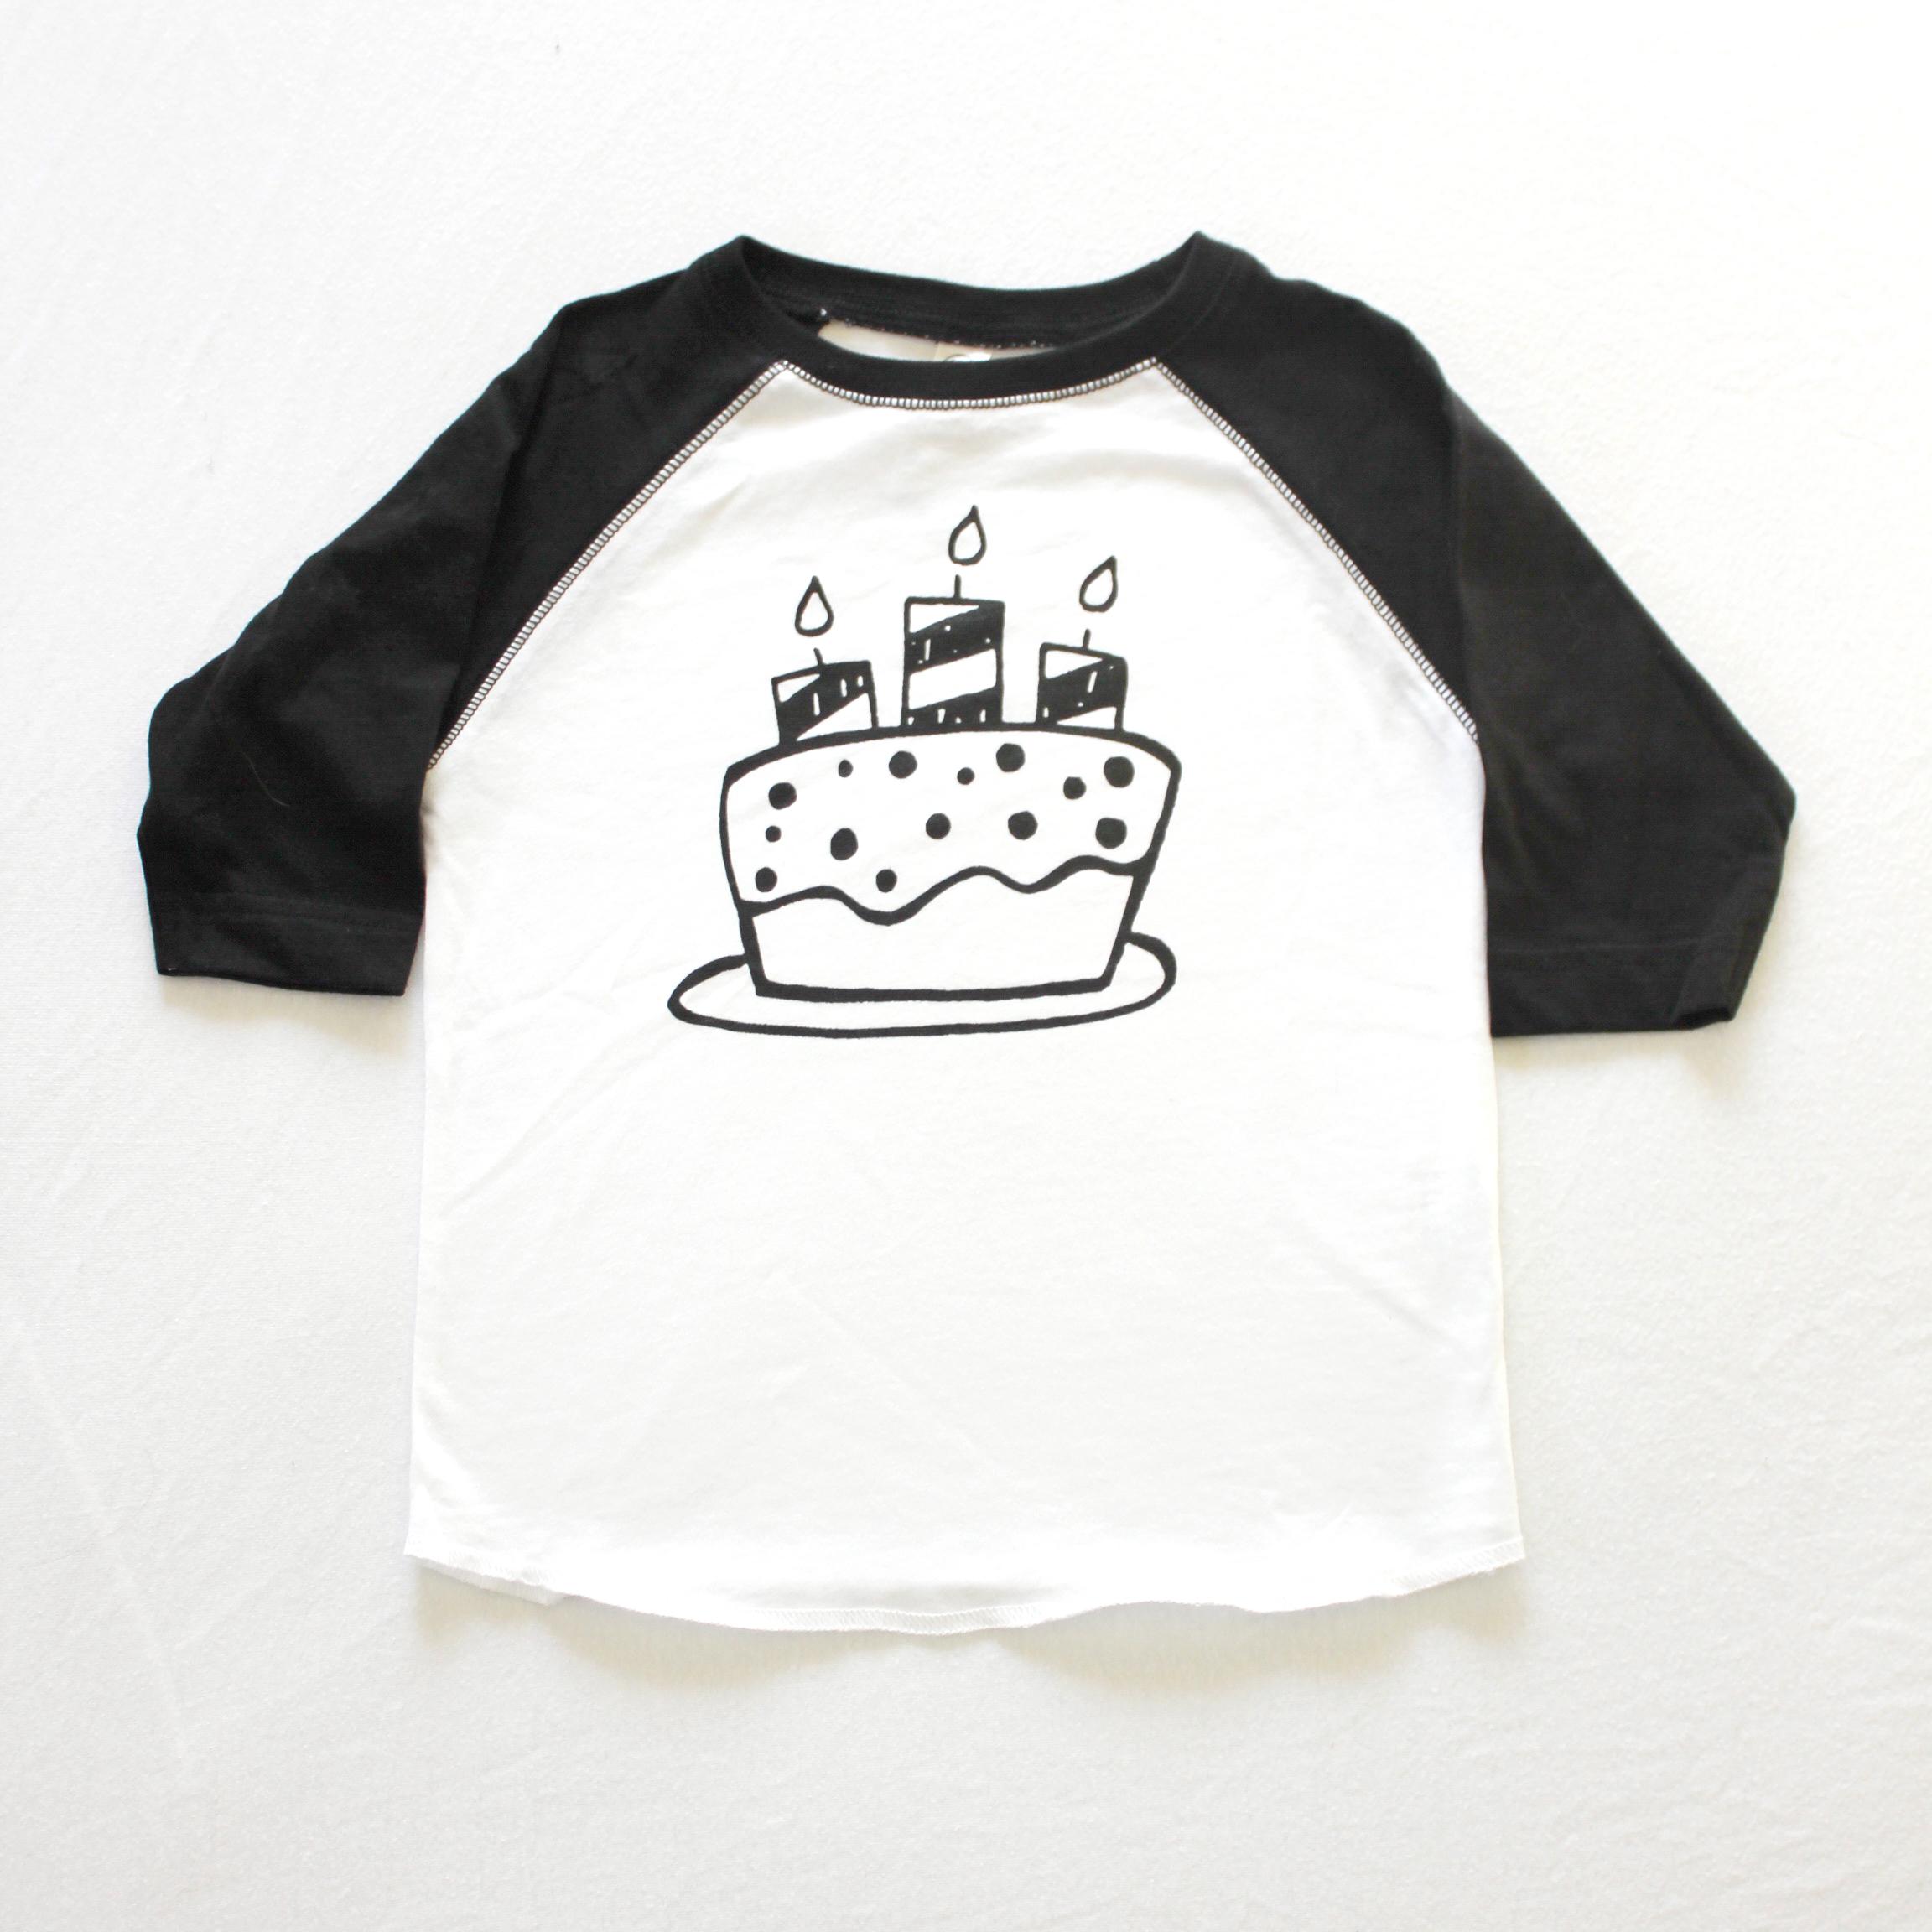 166a9914f Huck Tees: Birthday Shirt. fullsizeoutput_35cf.jpg